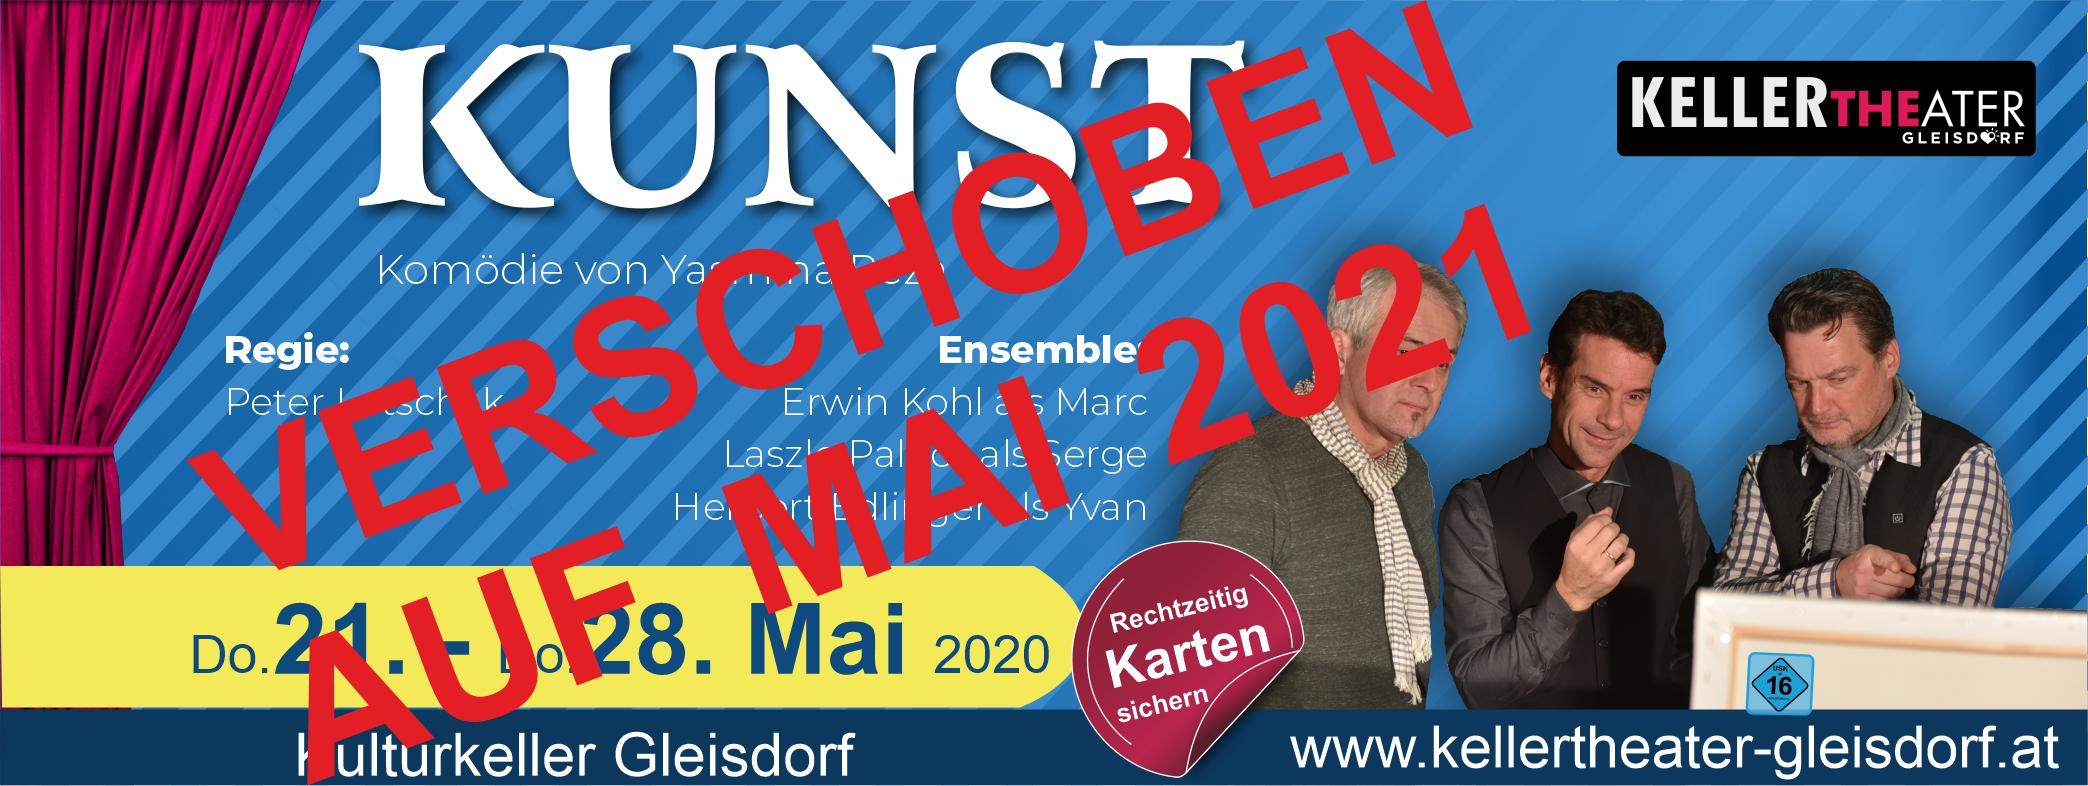 83958223772 - Stadtgemeinde Gleisdorf Jobbrse